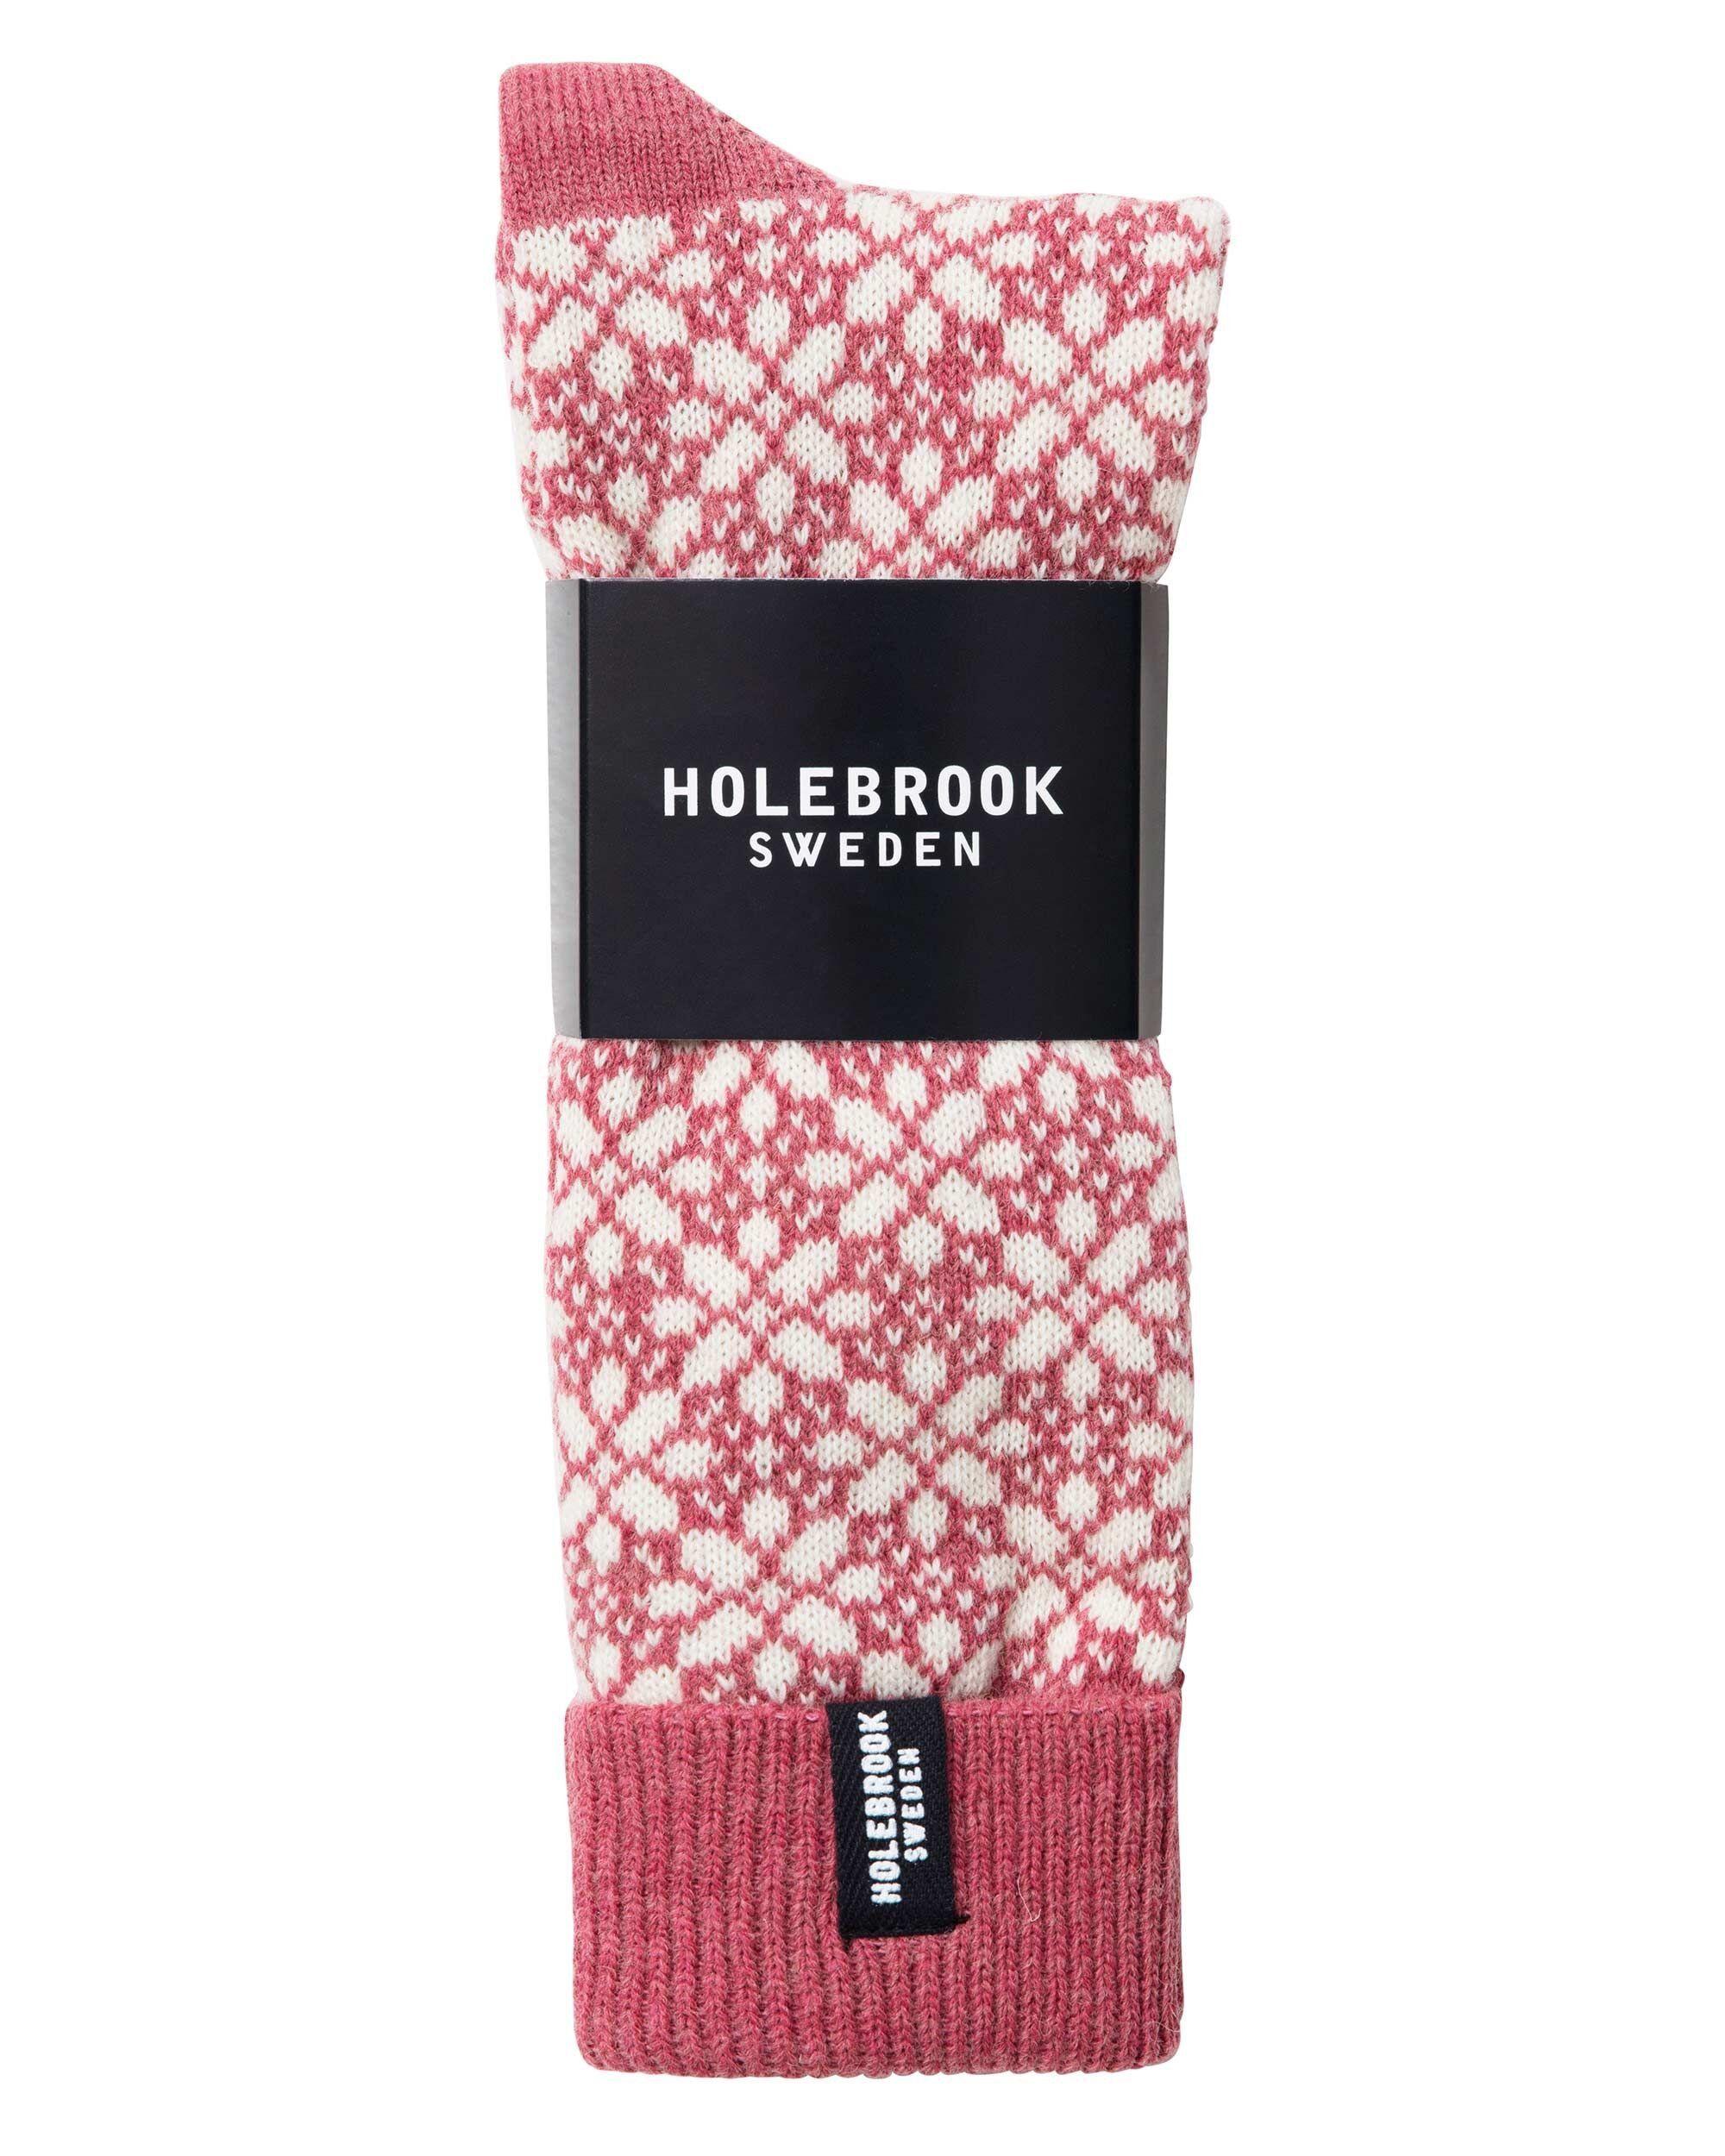 Holebrook Lindö Raggsocka Vintage Pink and Off White